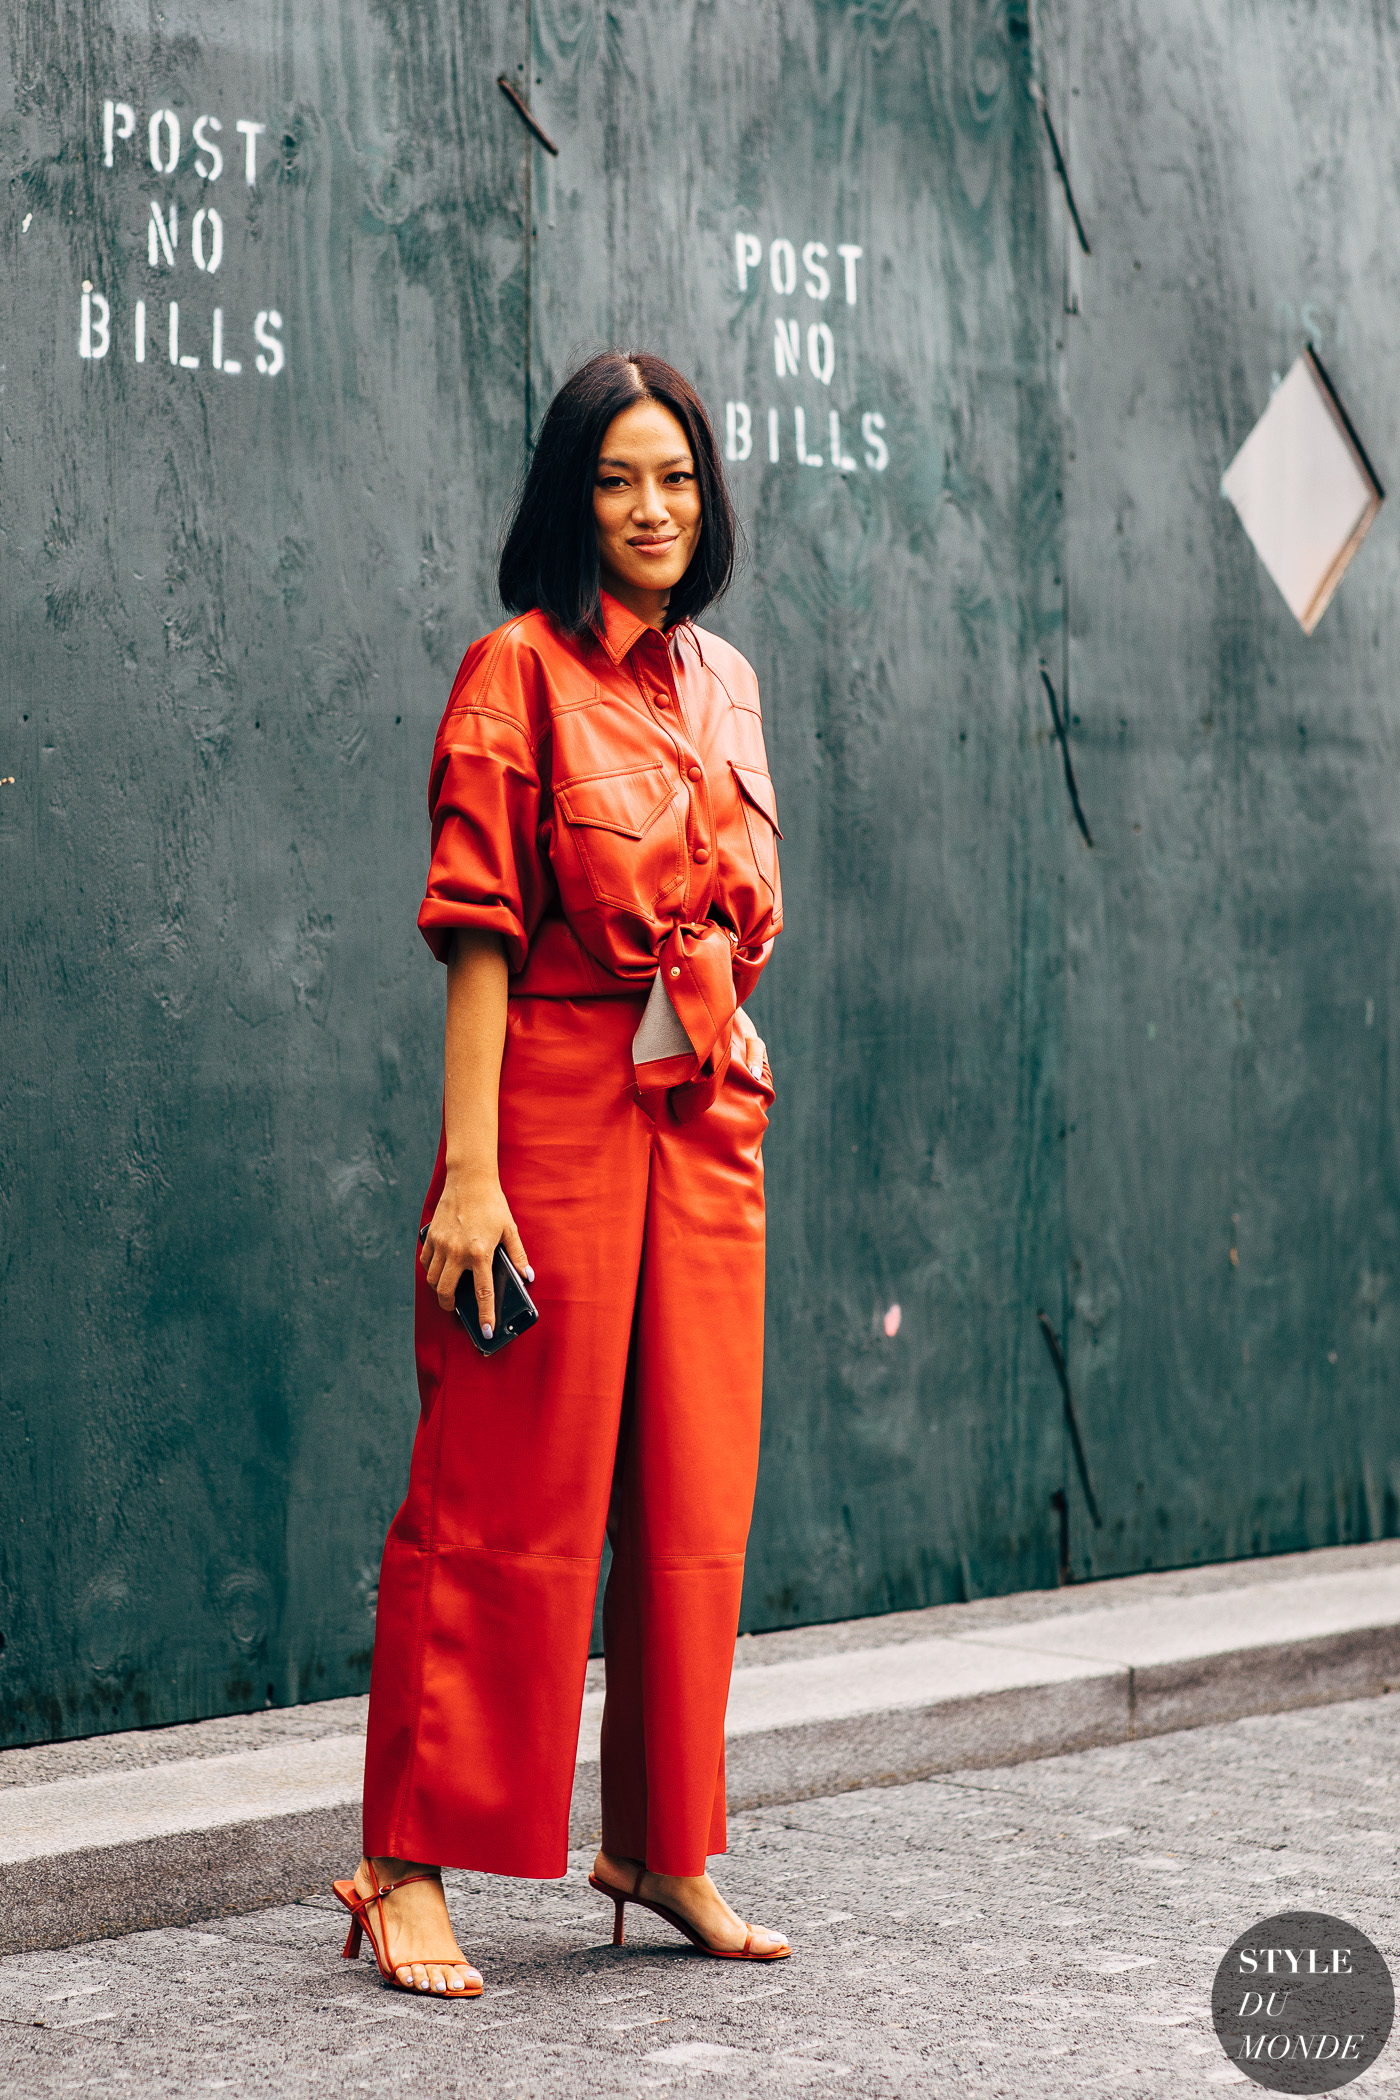 Paris models escort Yasmine, exclusive high end female